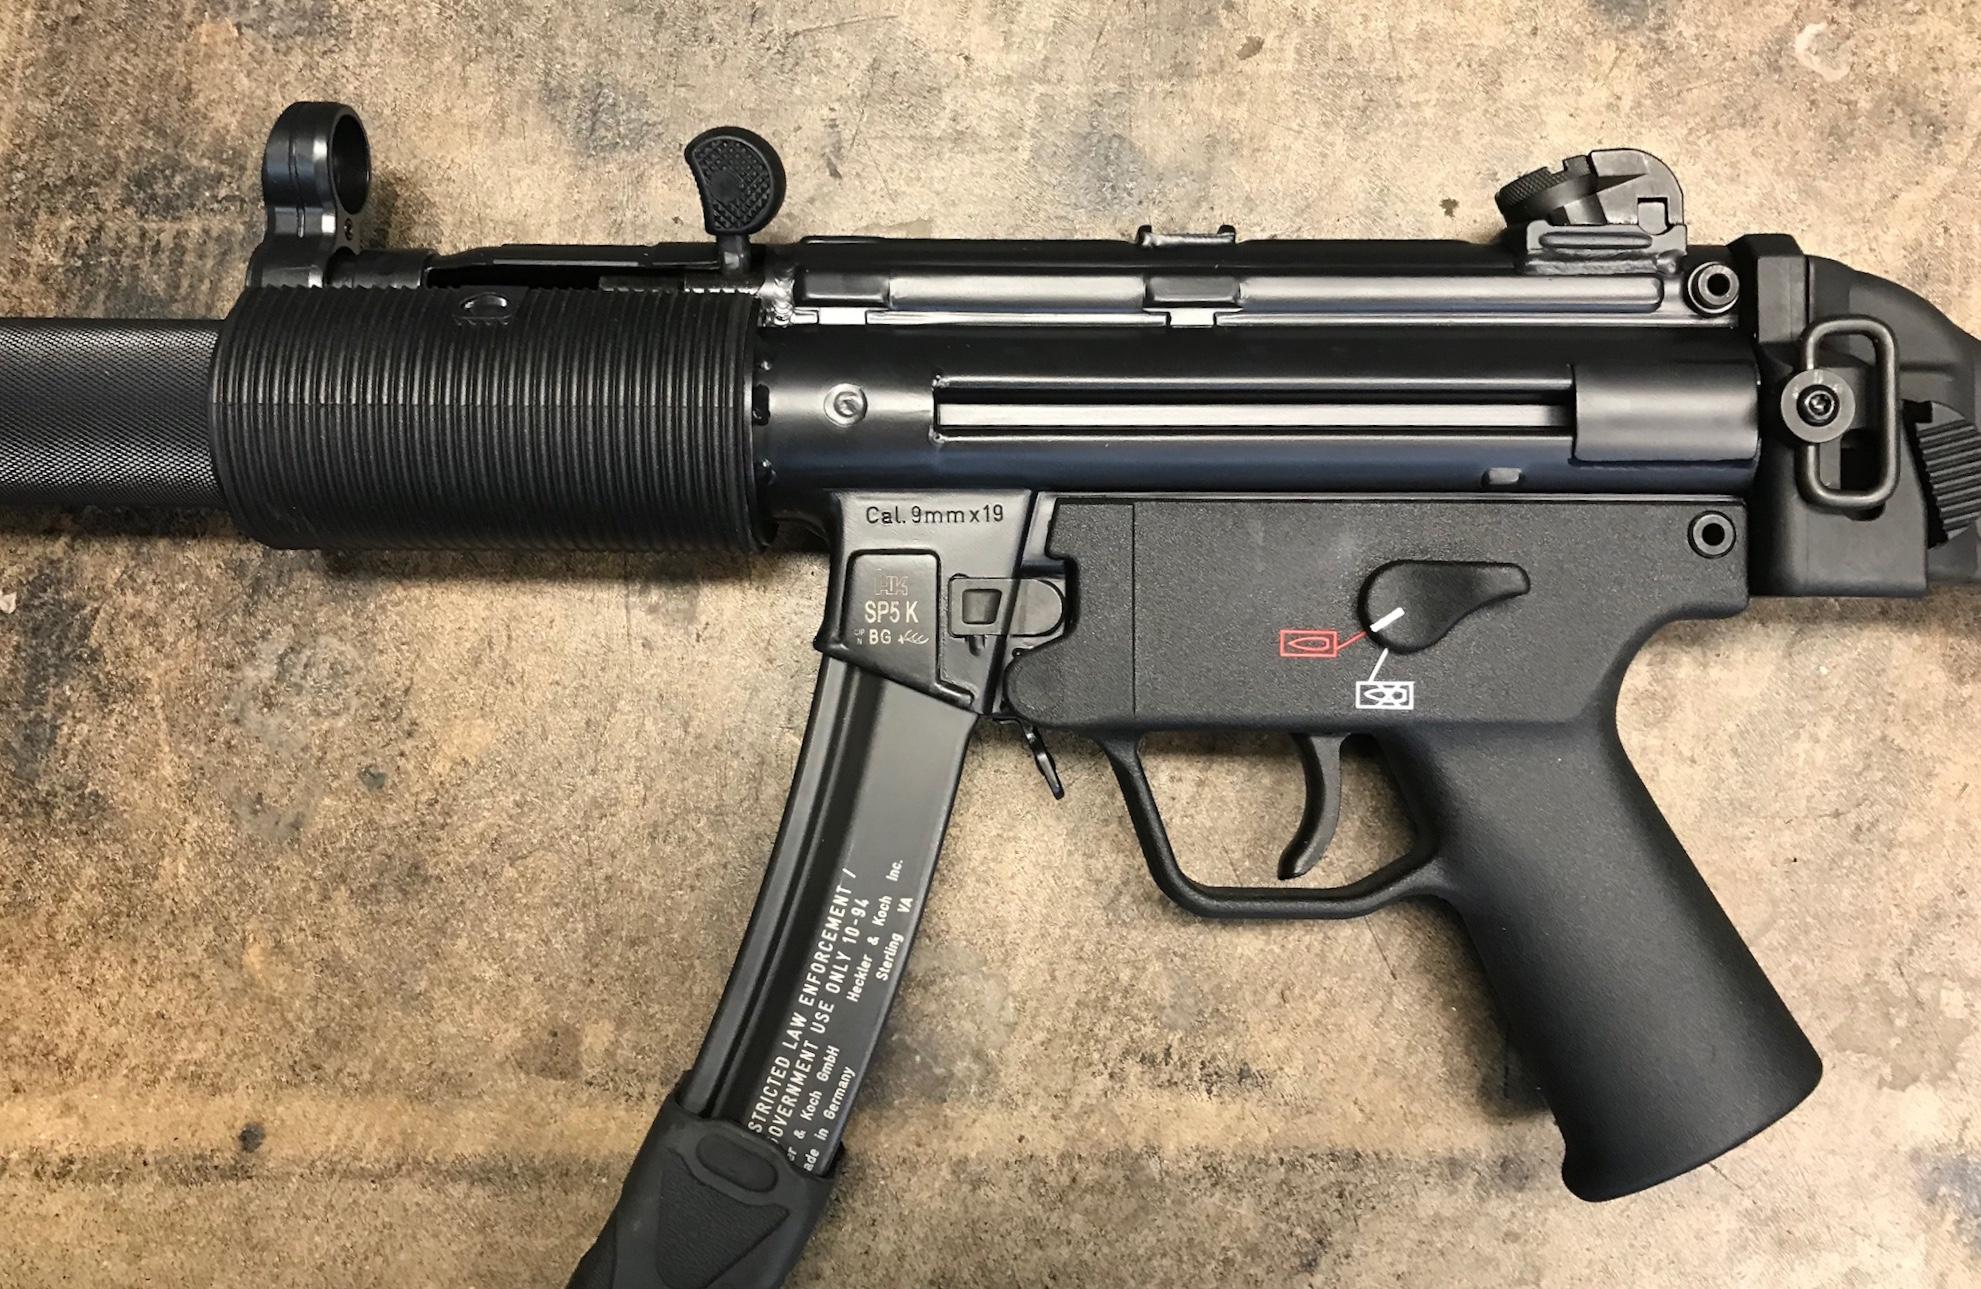 HK SP5K to MP5KSD conversion